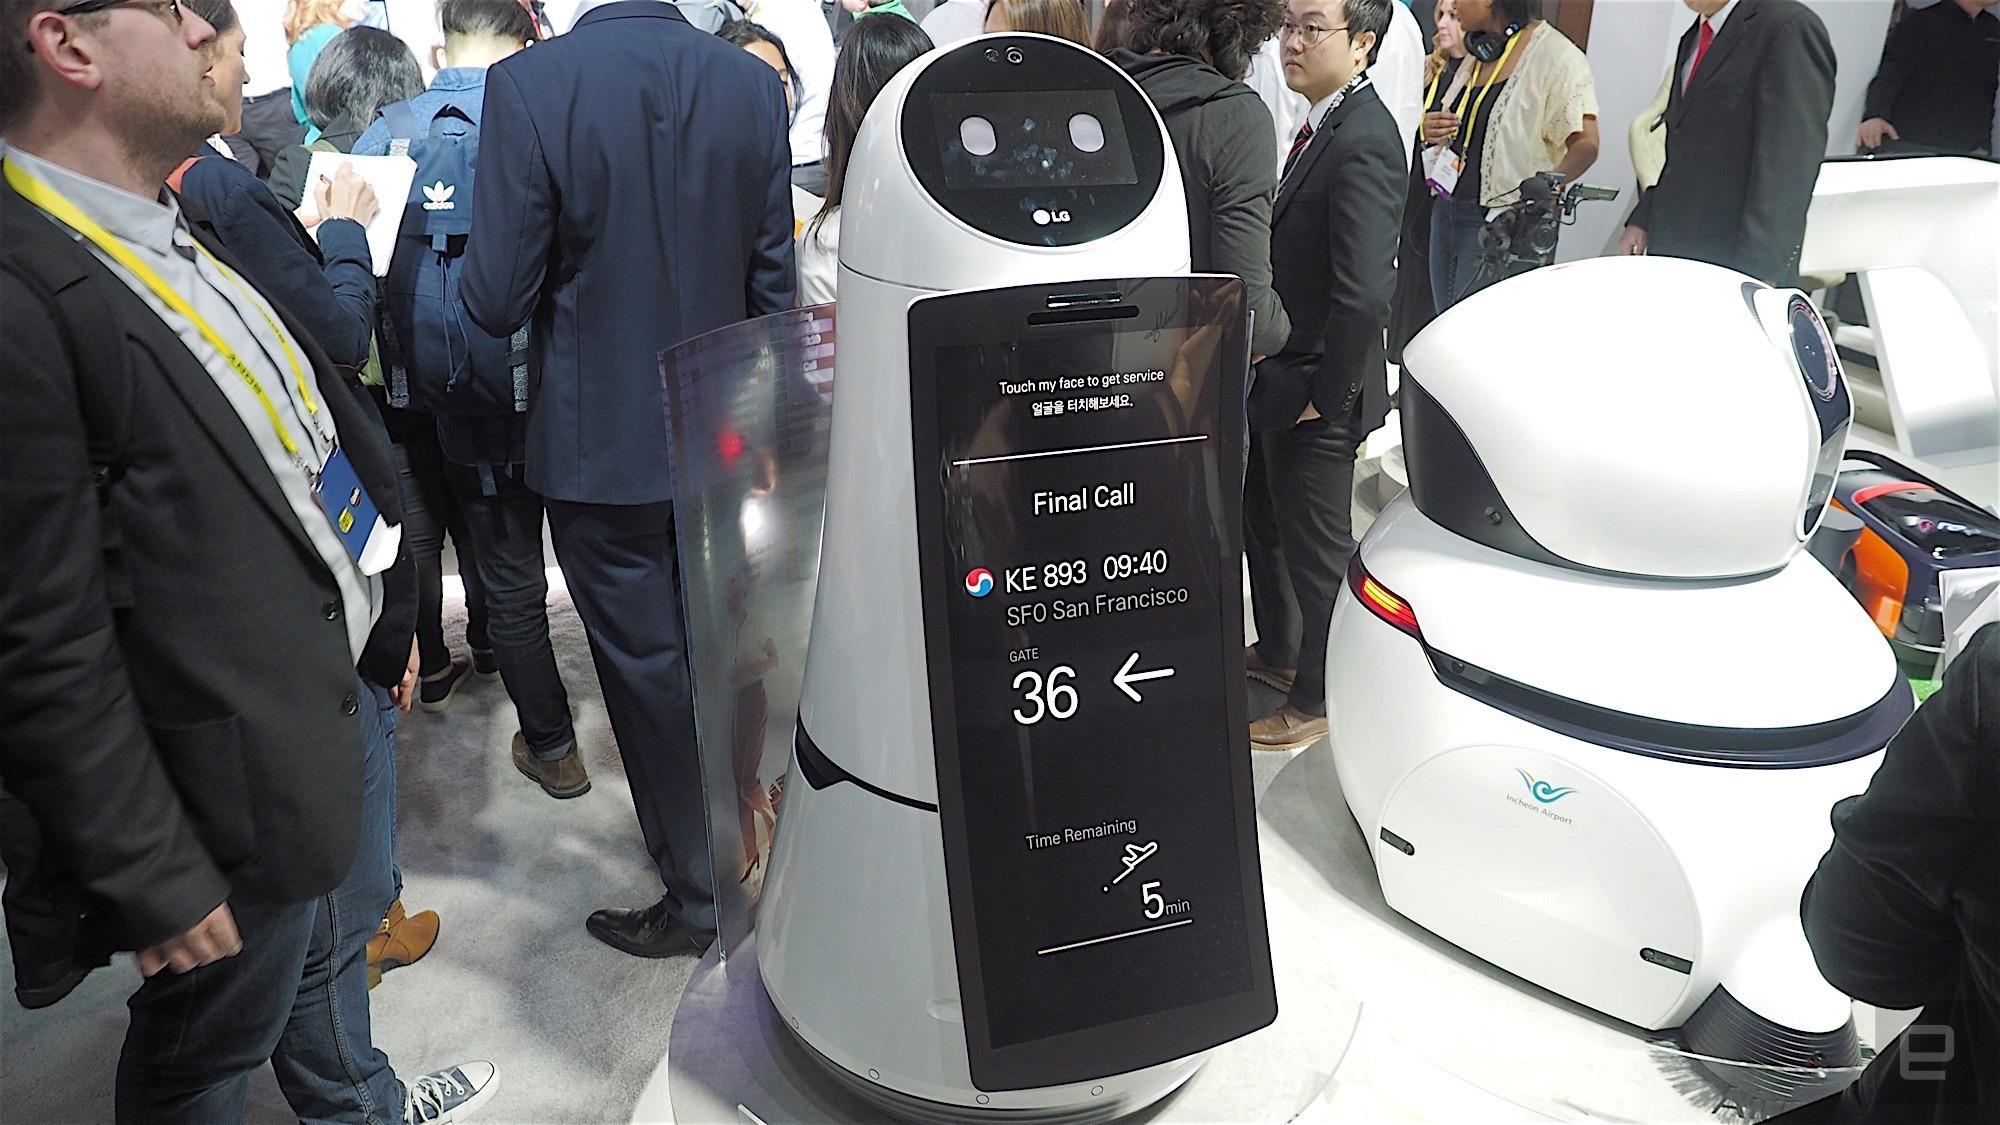 Top 6 Best Robots at Airport 2018 -19   Spencer   Pepper   LG's Robot   Humanoid Robot  